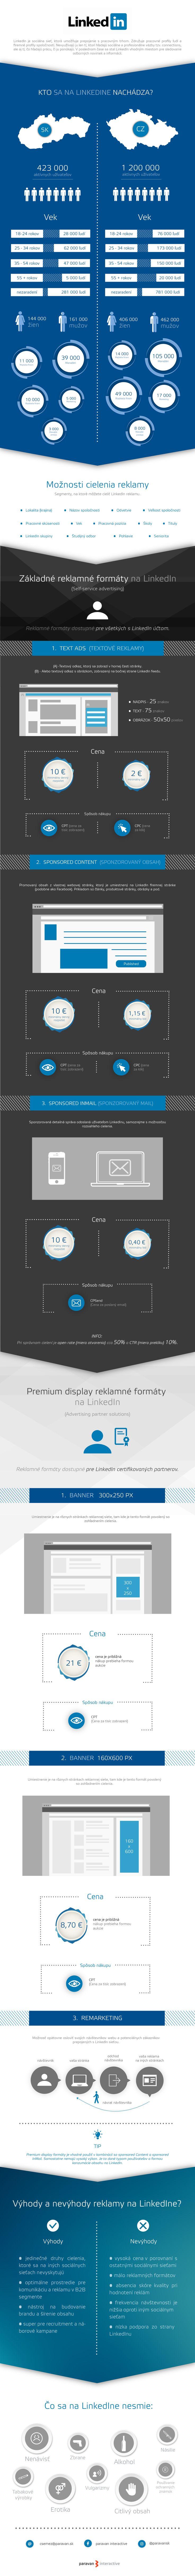 LinkedIn reklama infografika